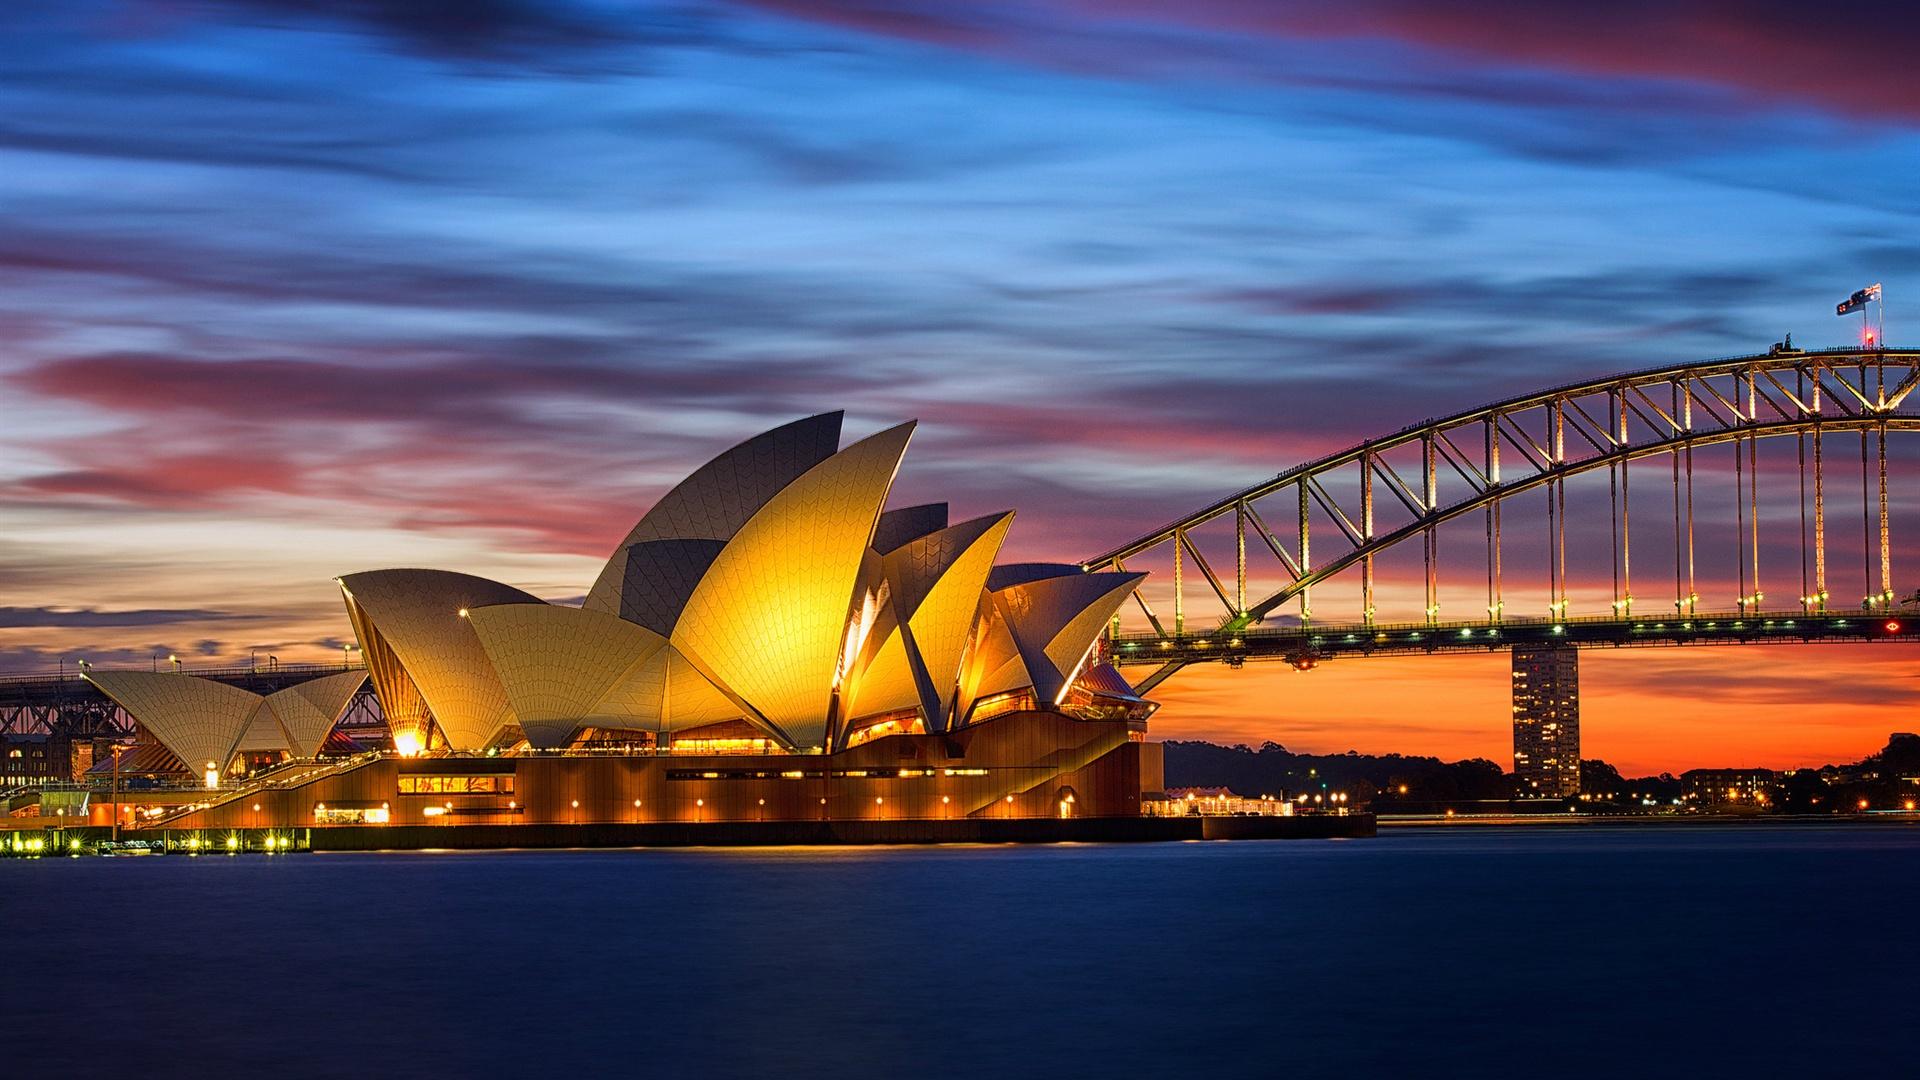 httpjabest wallpapernetAustralia Sydney Opera House bridge 1920x1080